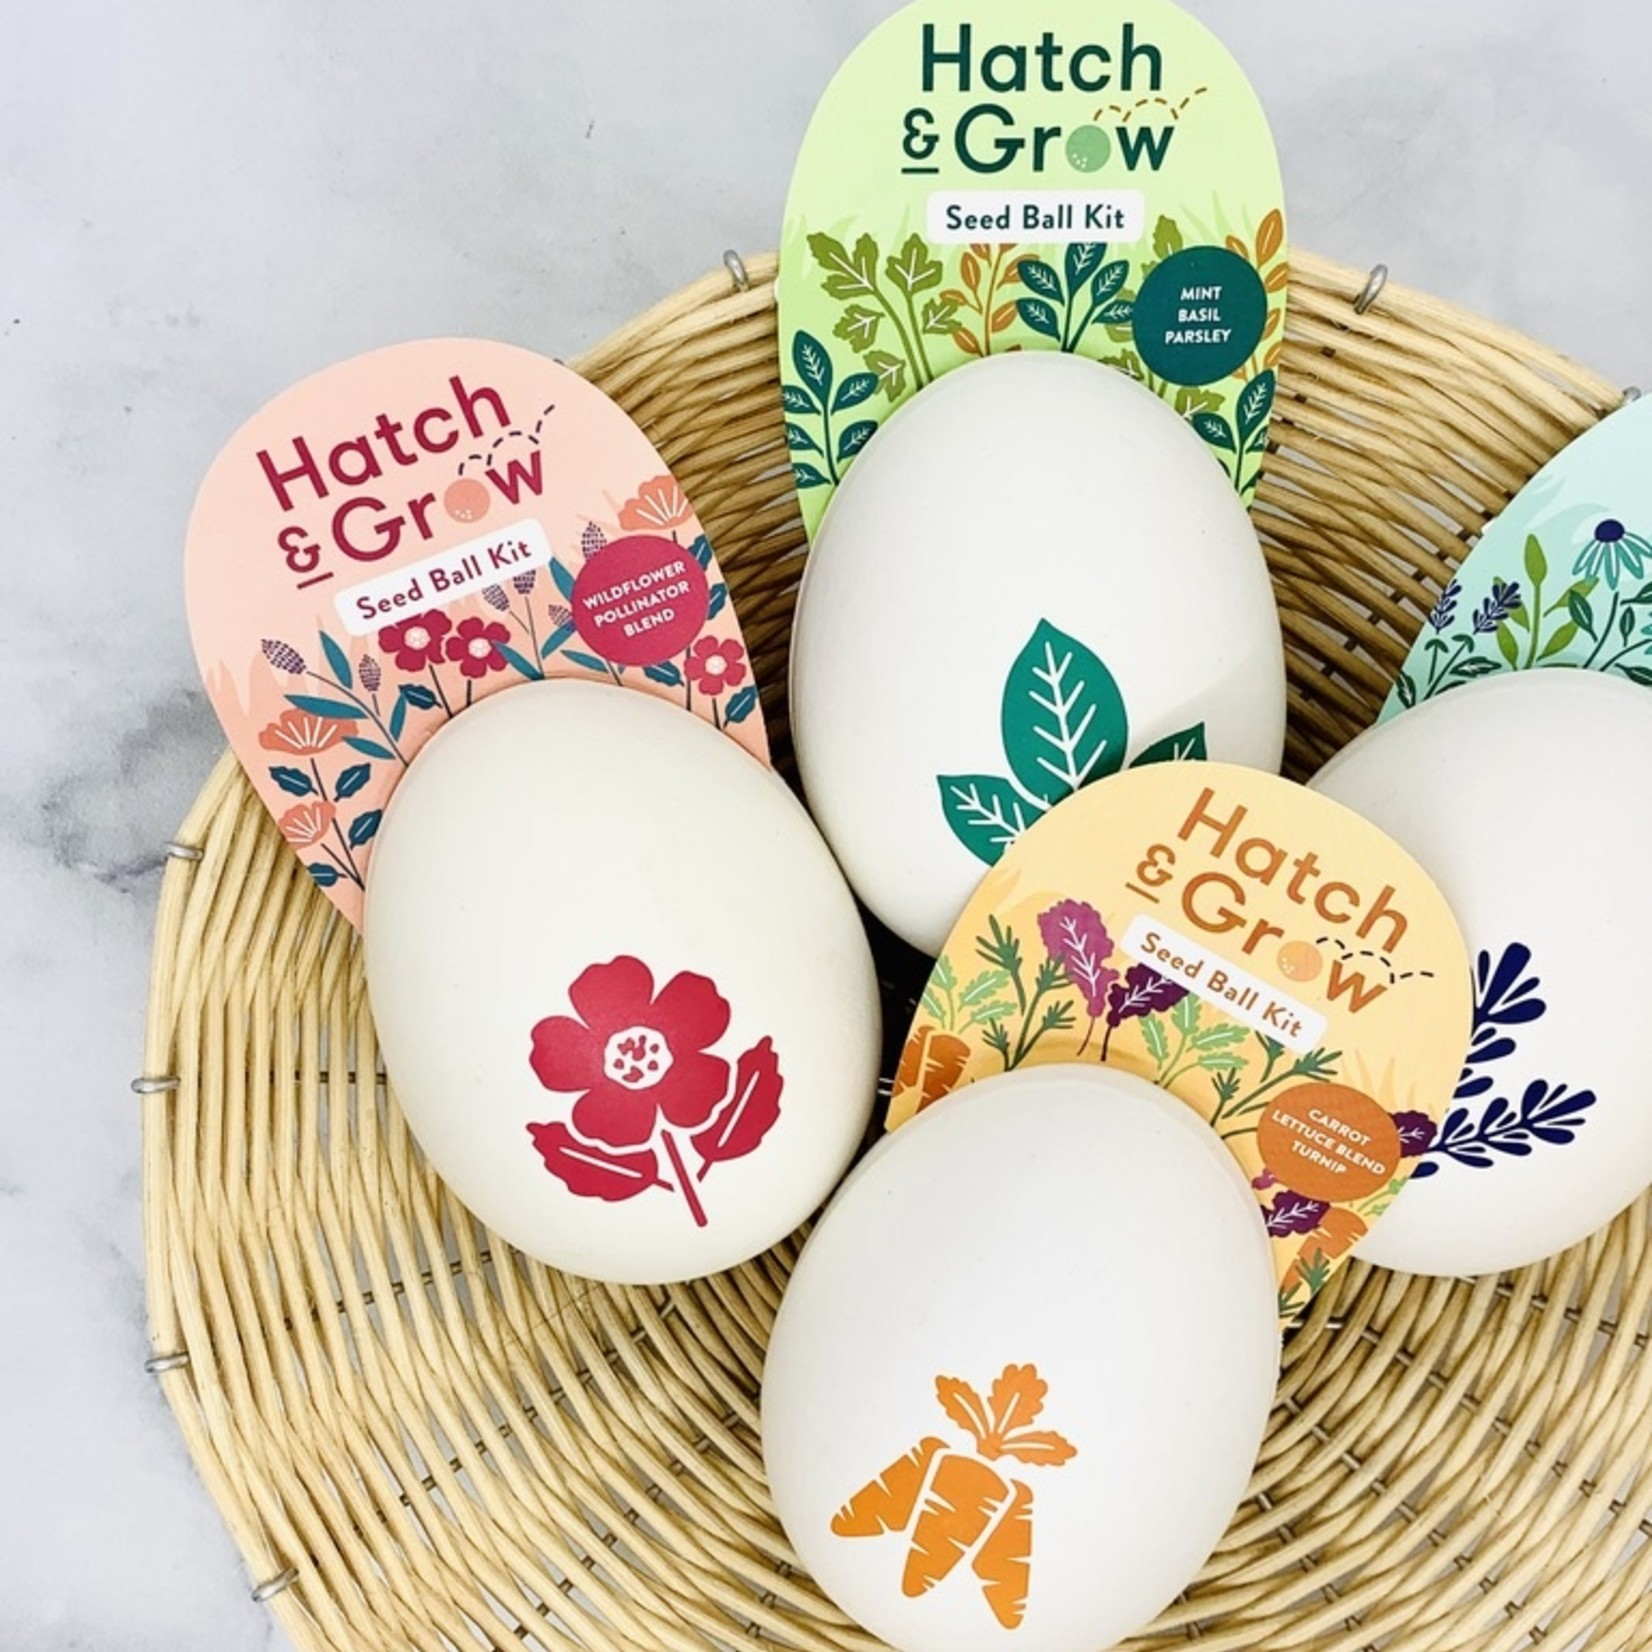 Hatch & Grow: